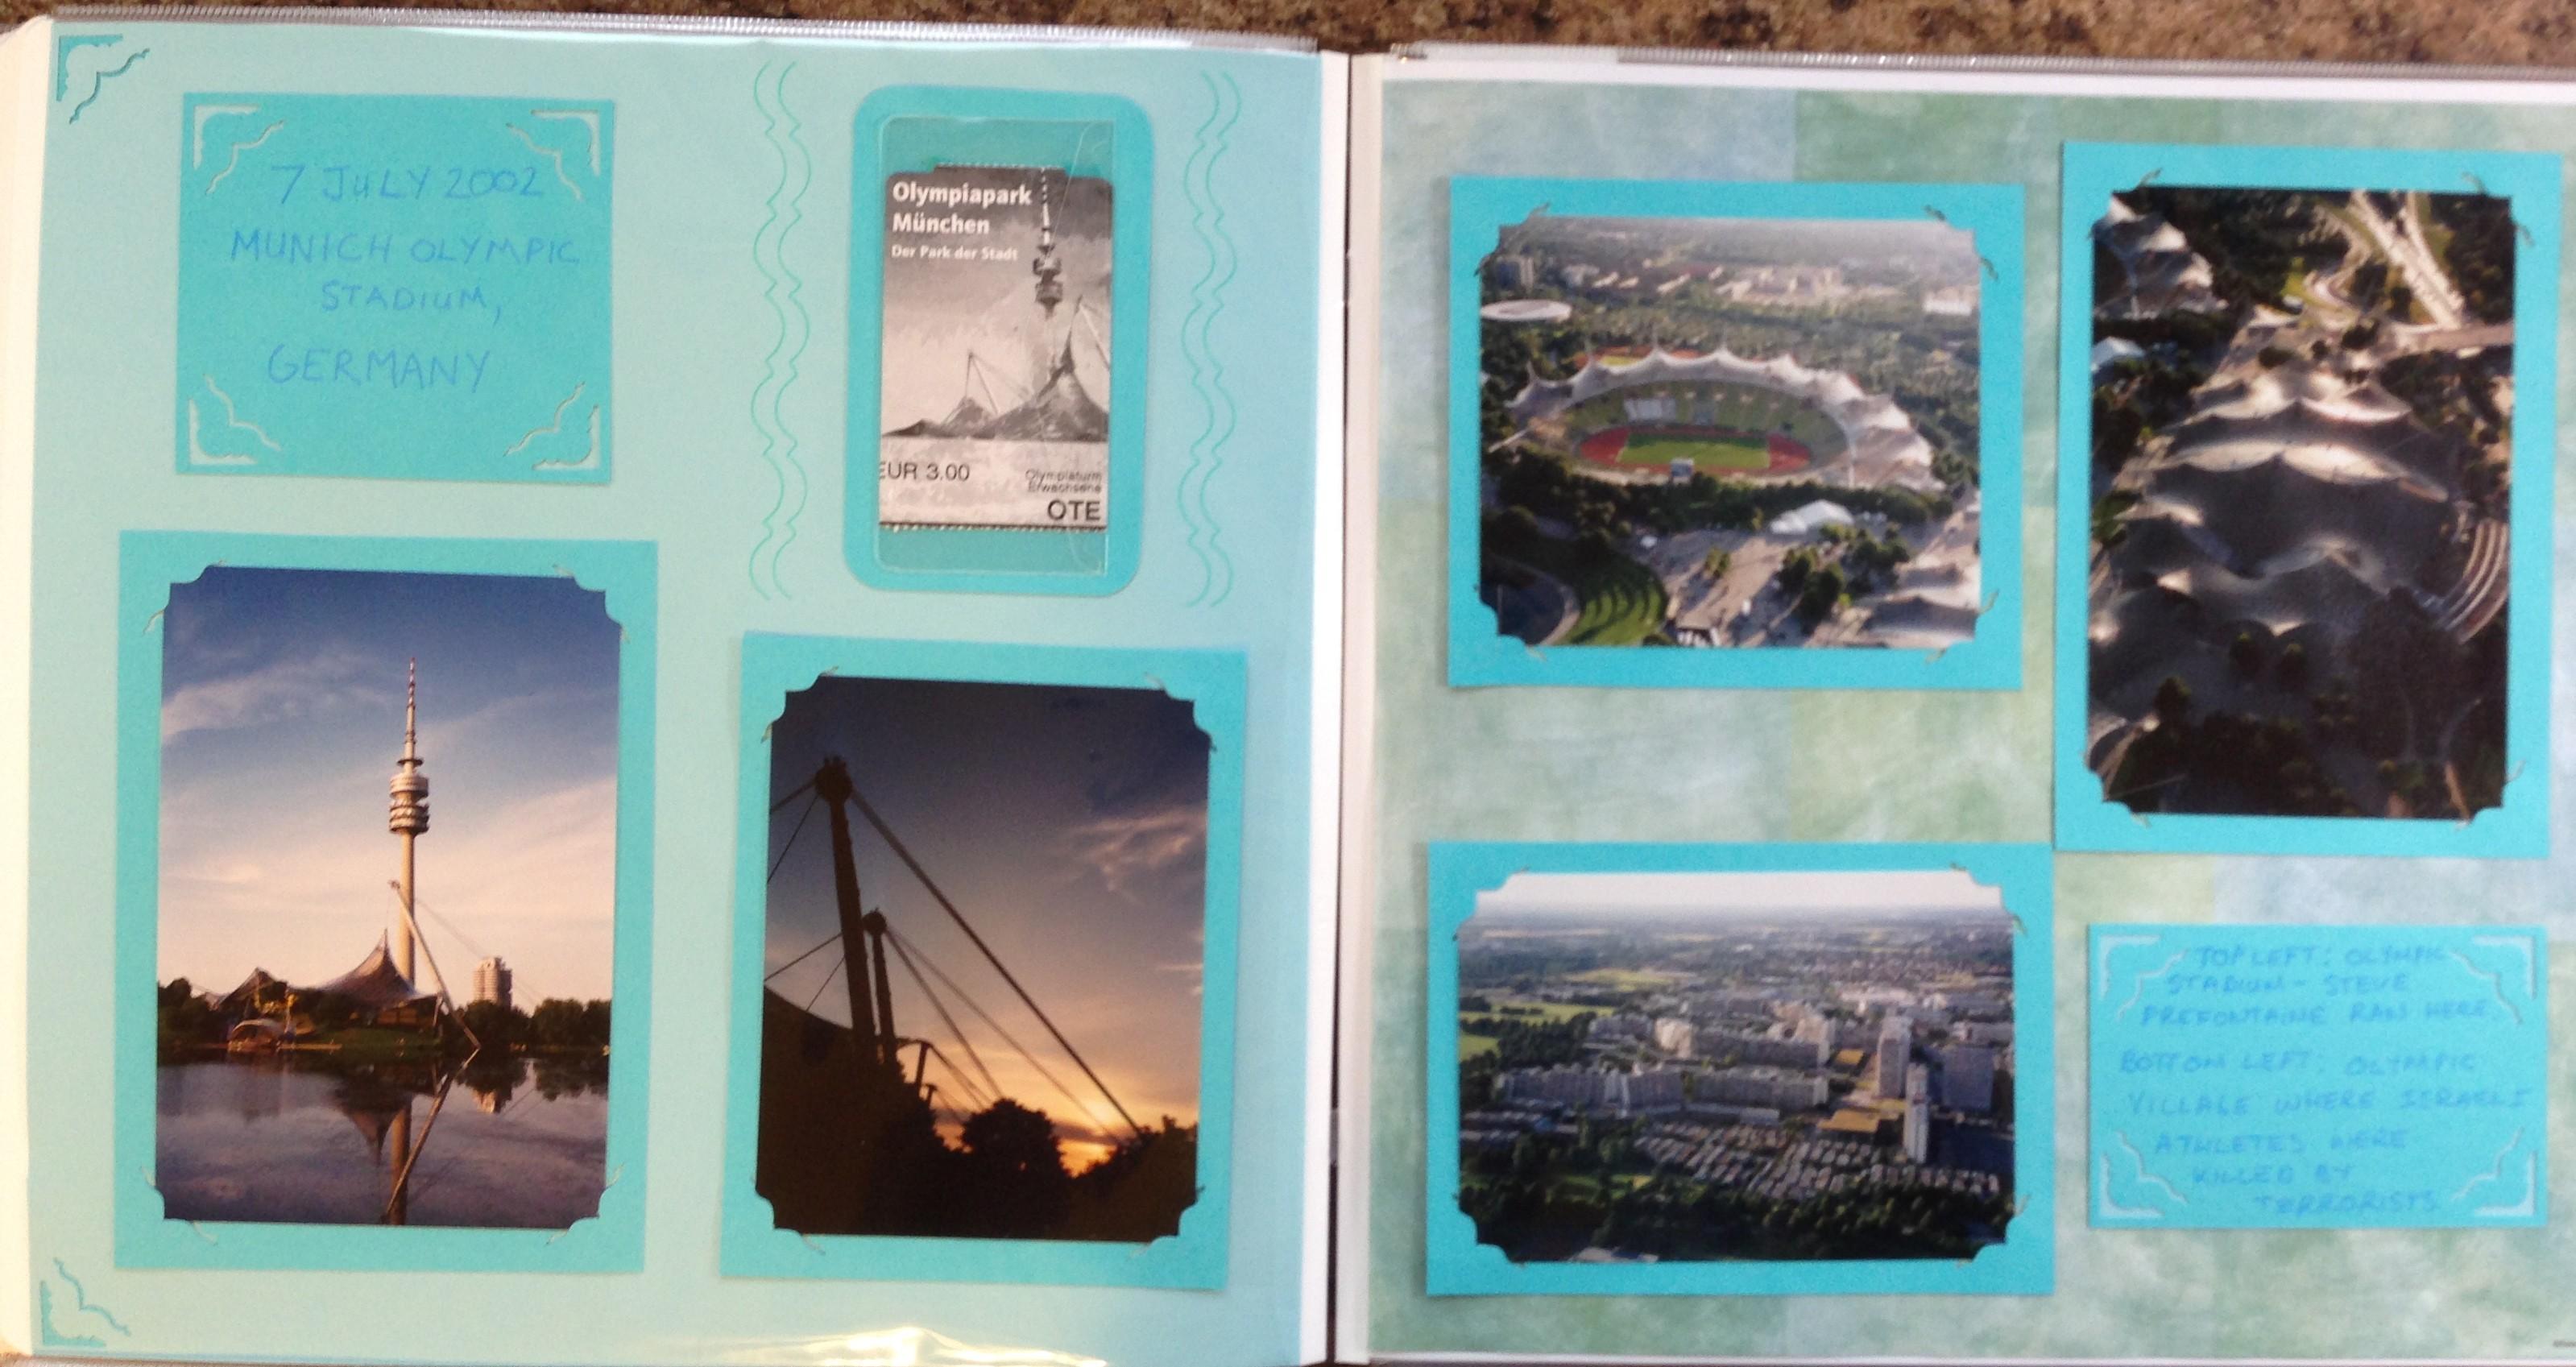 Europe scrapbook ideas - Europe Vacation Munich Germany Olympic Stadium